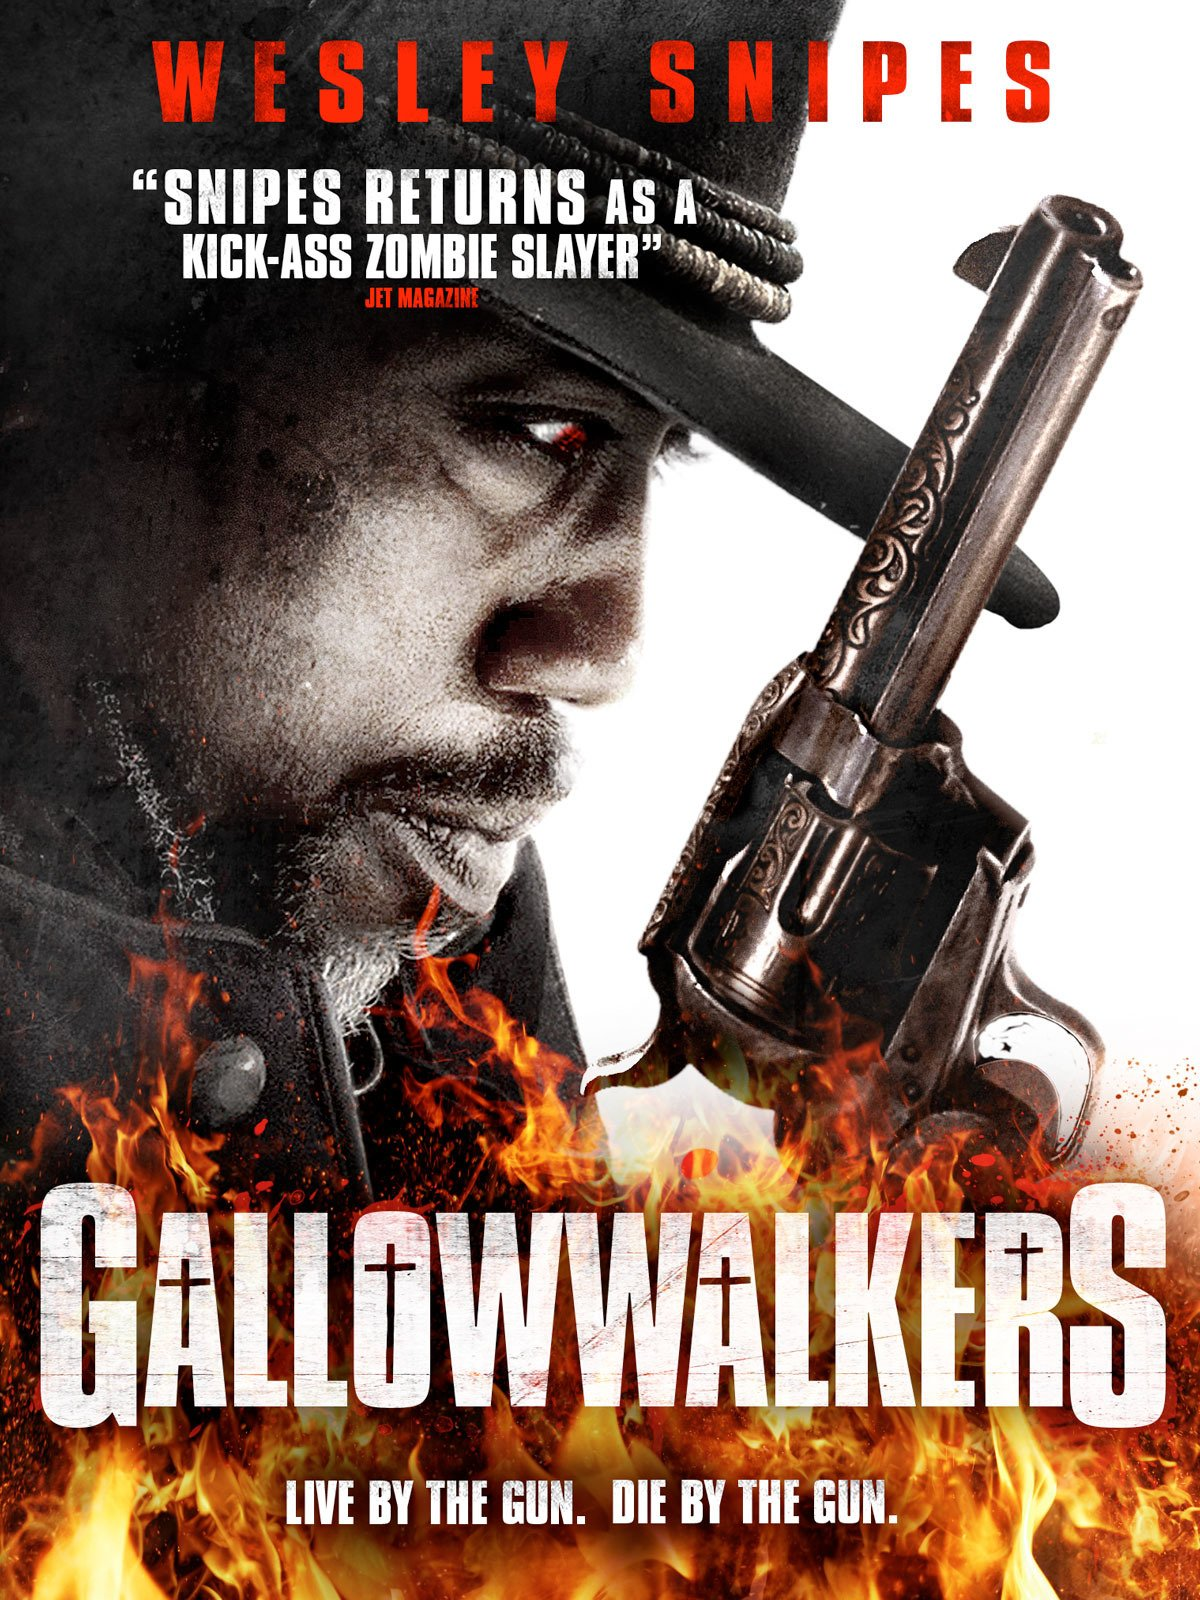 Gallowalkers